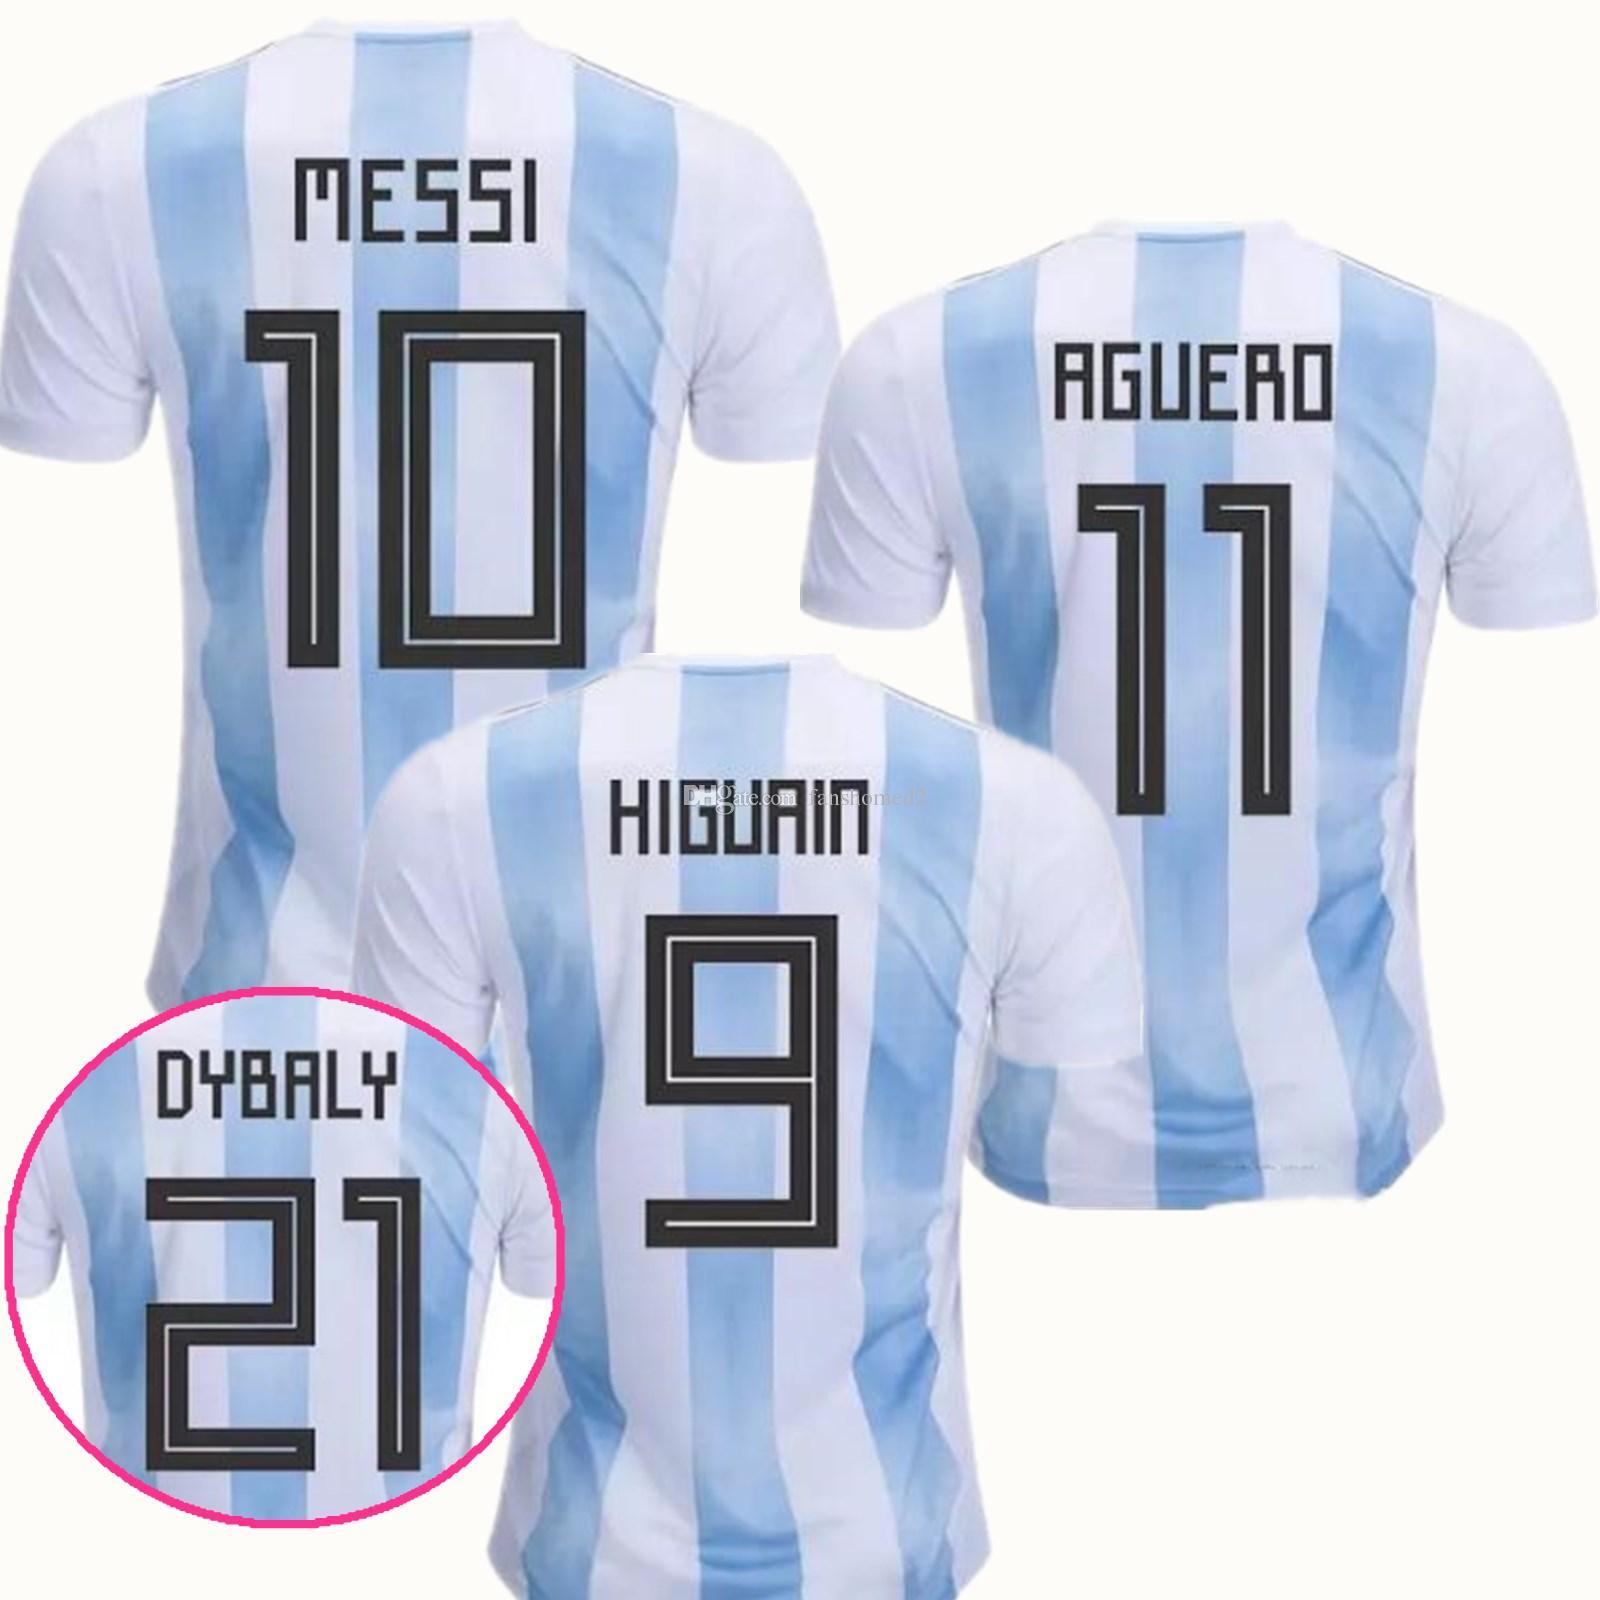 065d9d86d494d 2018 Argentina Copa Del Mundo Jersey 10 MESSI DI MARIA AGUERO KOMPANY  DYBALA Higuain Local Blue Away Adultos Argentina Soccer Jersey Camiseta De  Fútbol Por ...